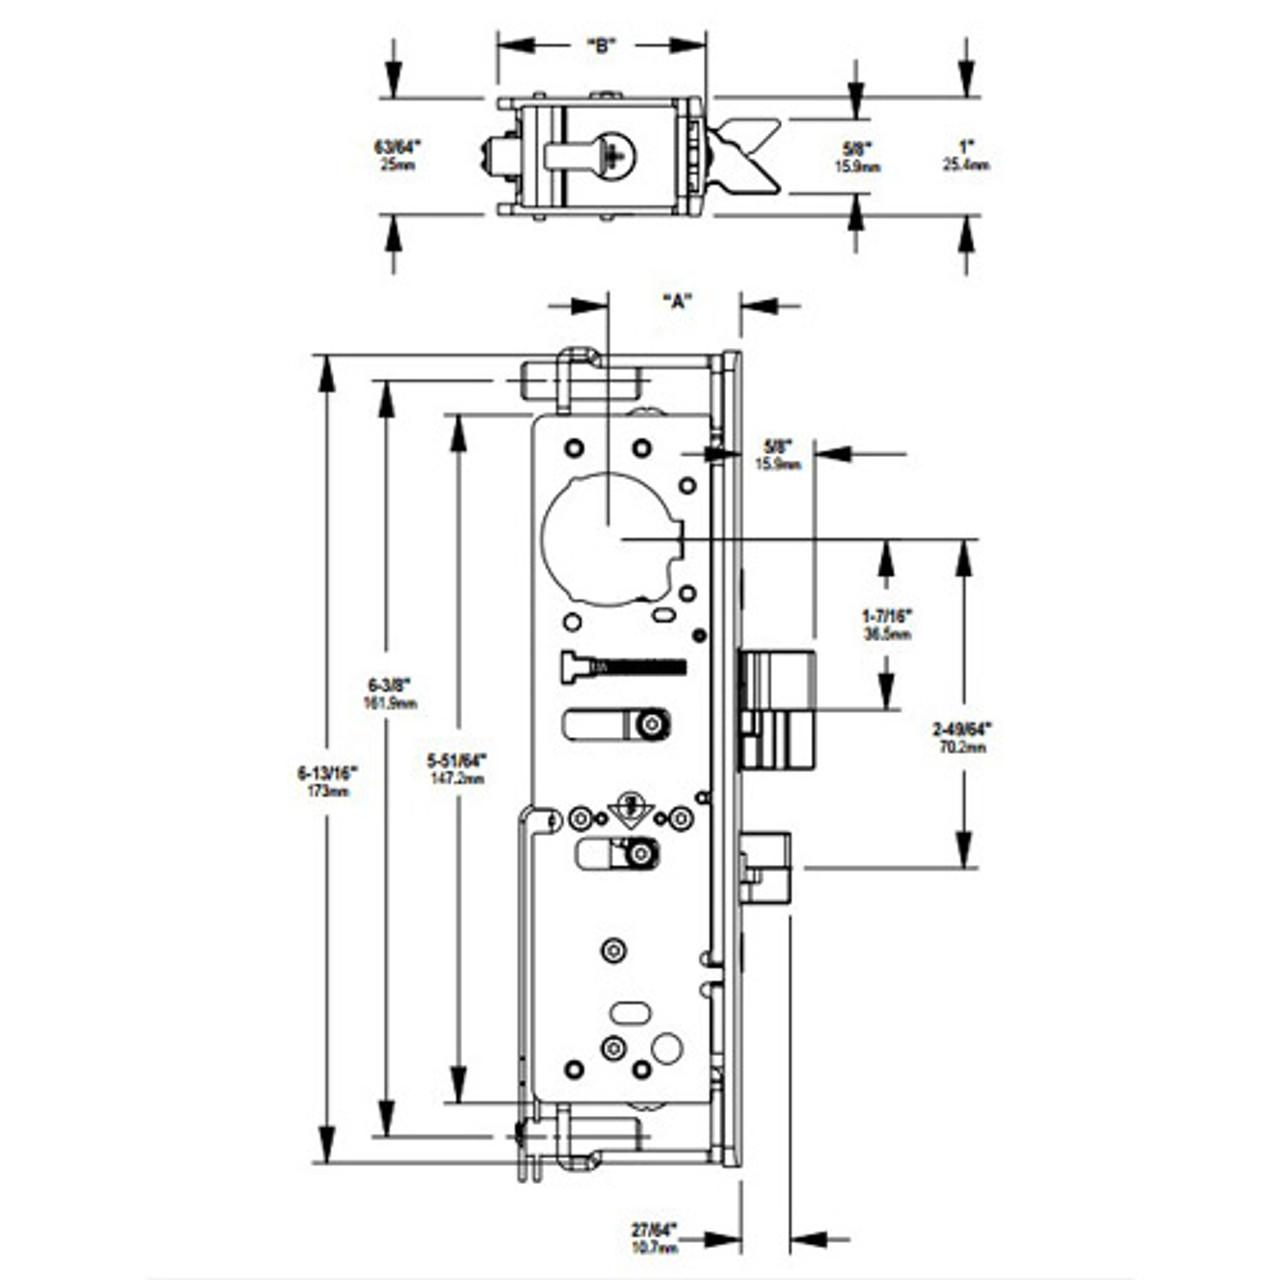 4300-30-101-313 Adams Rite Electrified Deadlatch Dimensional View